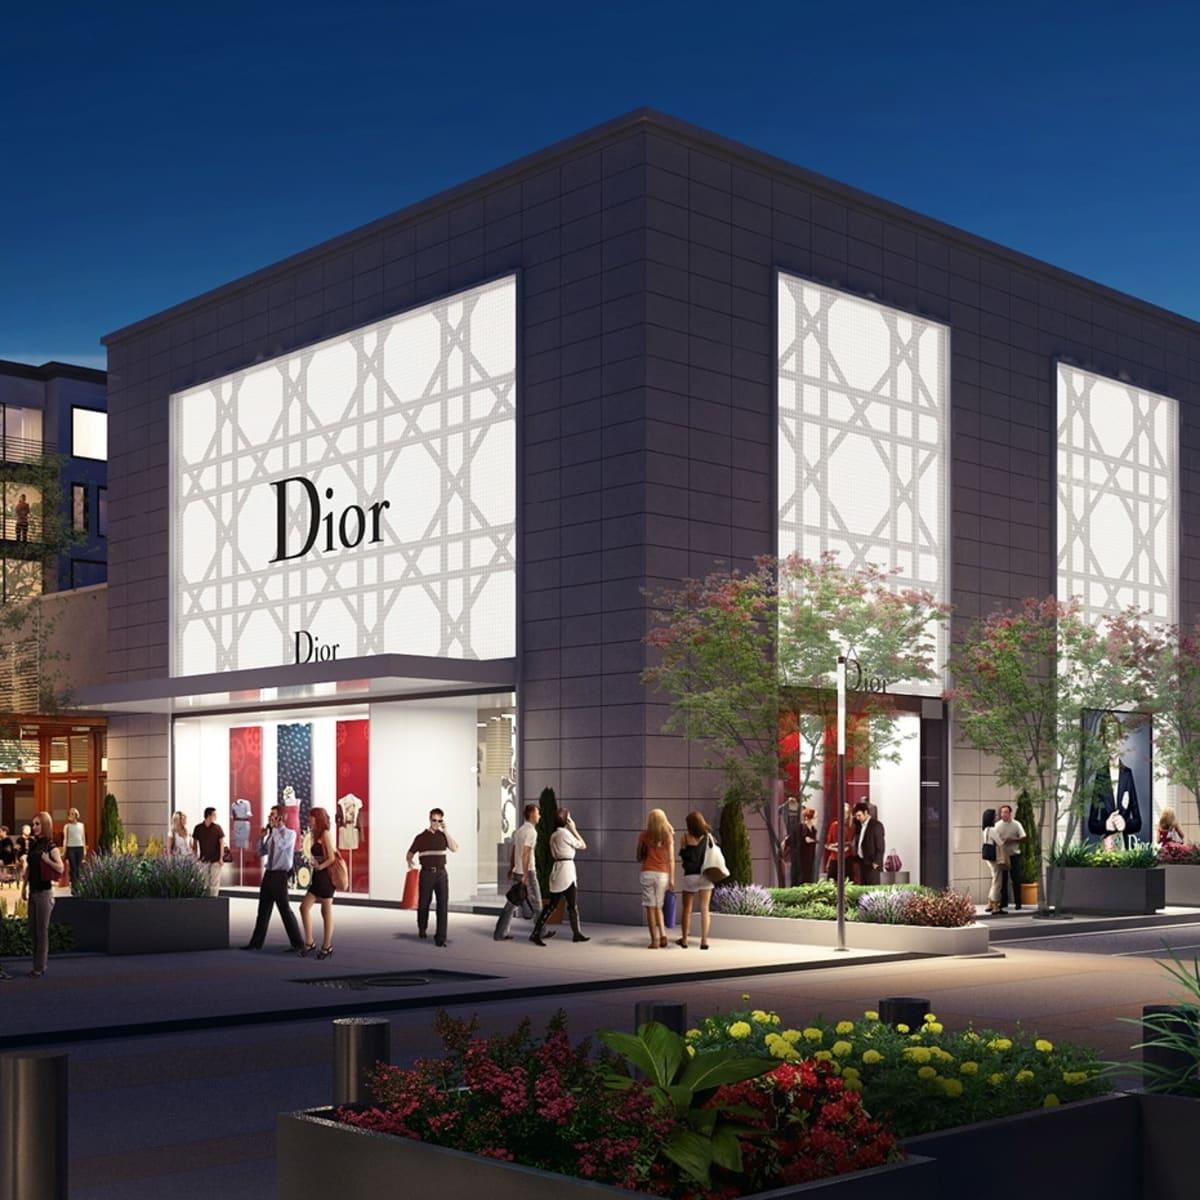 Houston, River Oaks District, June 2015, Dior